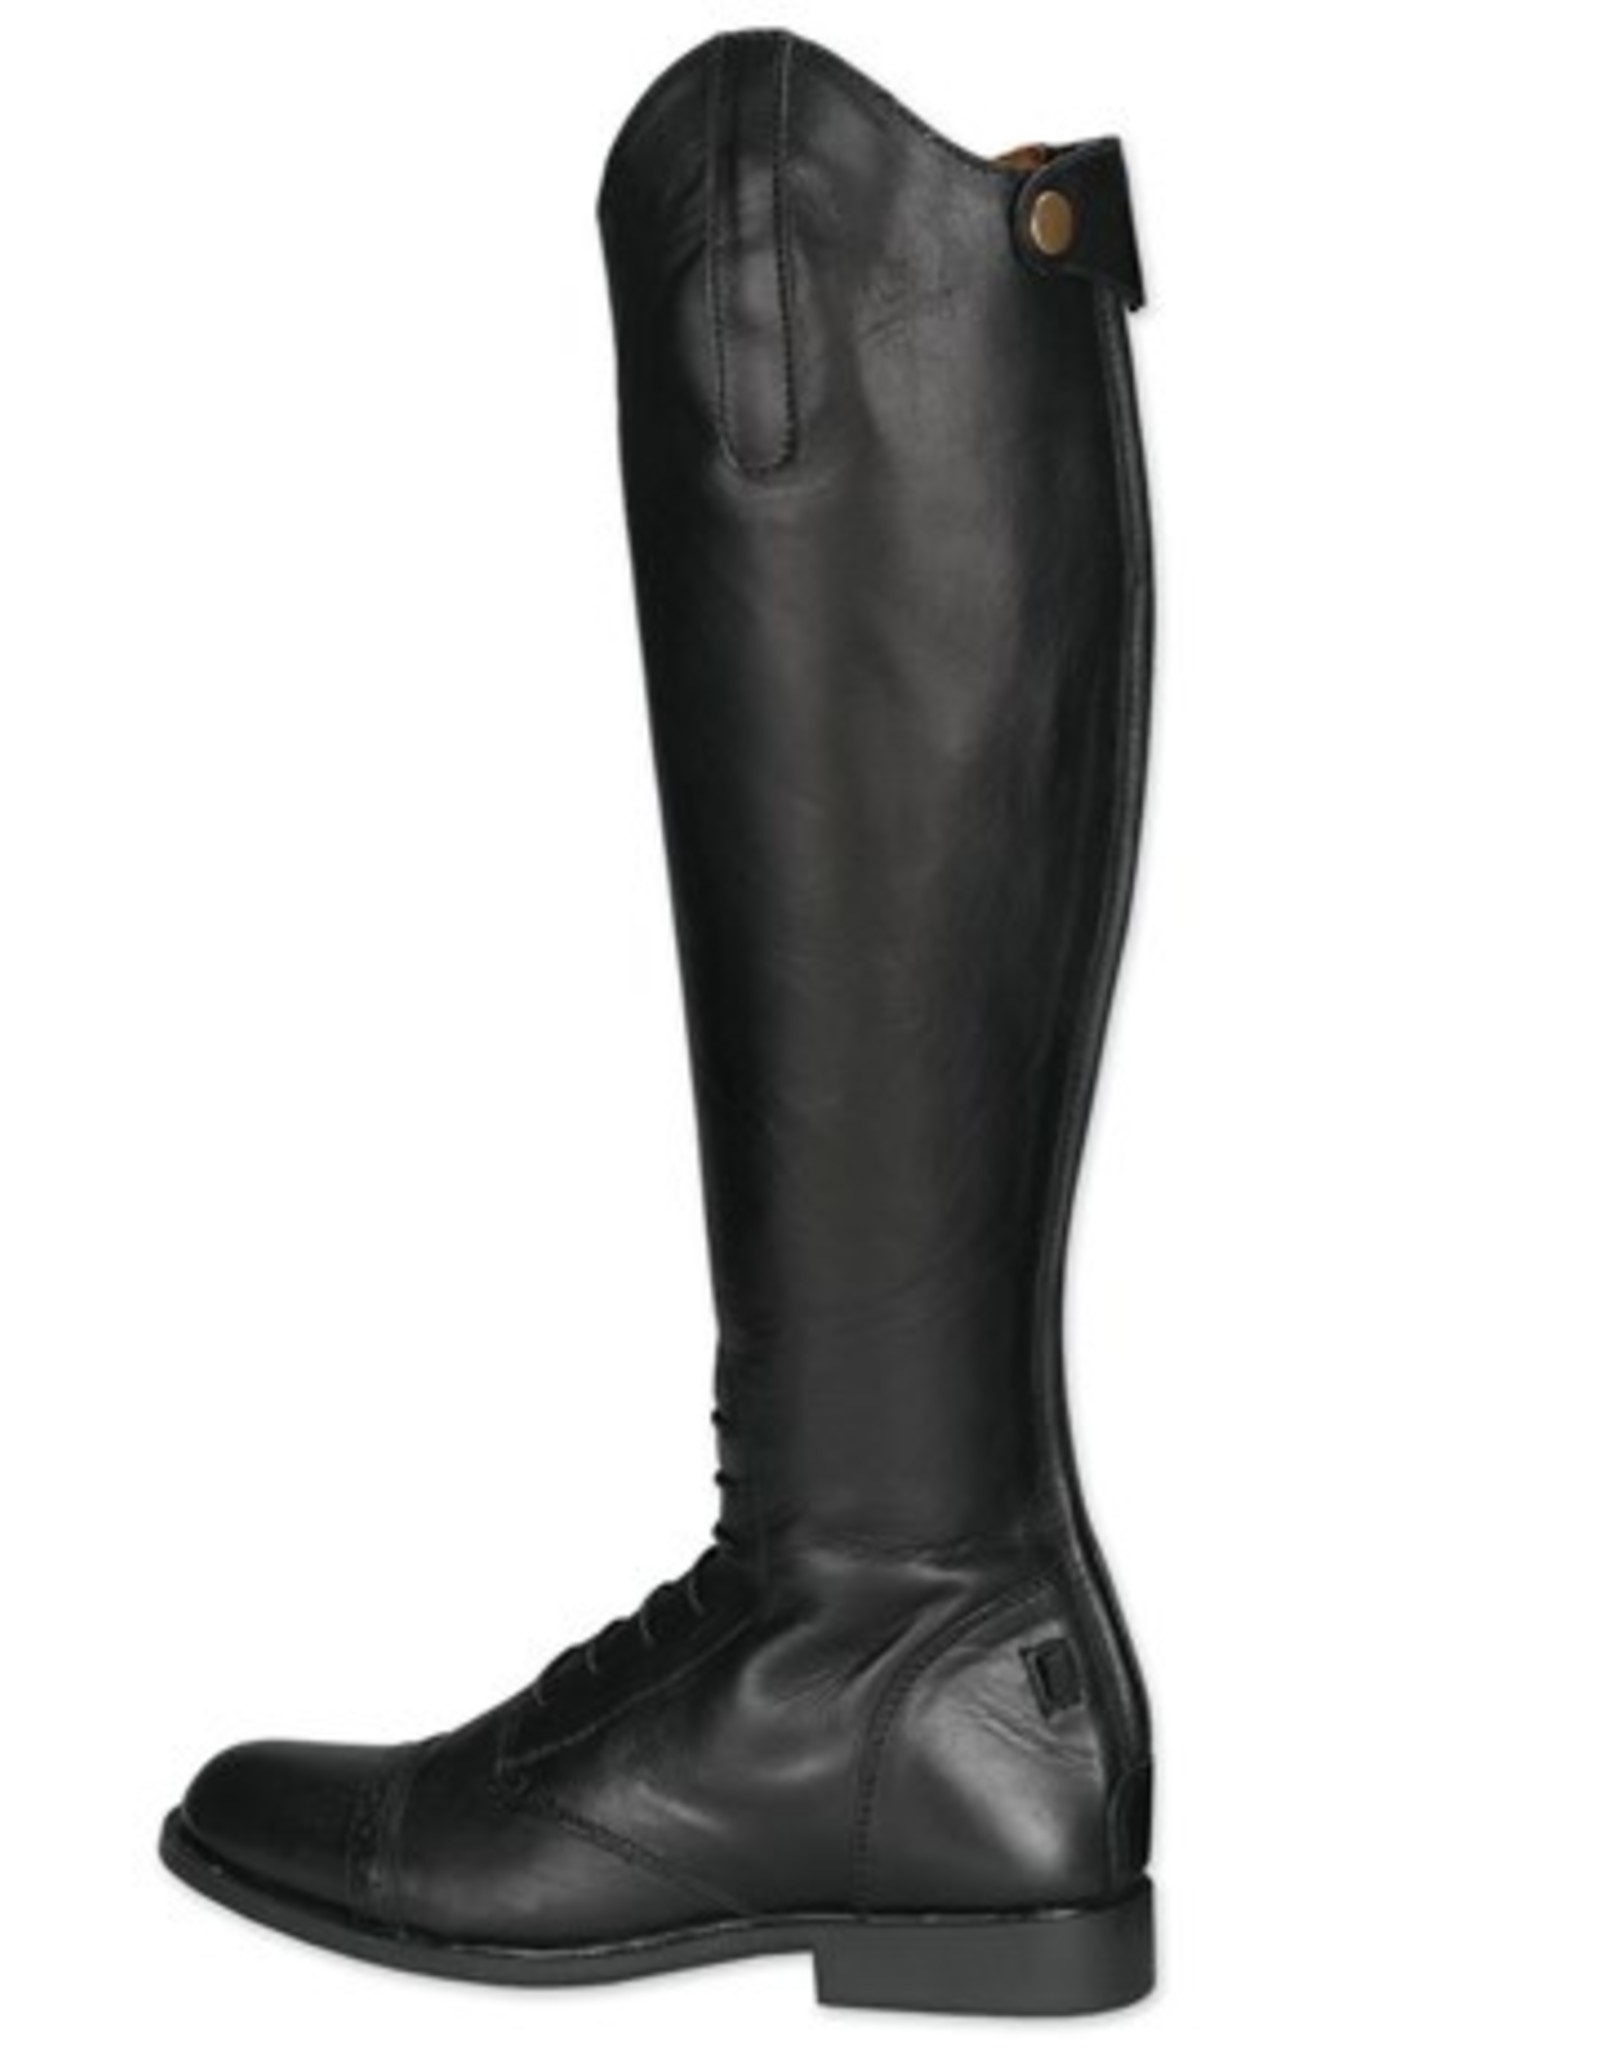 Tuff Rider Baroque Kid's Field Boot